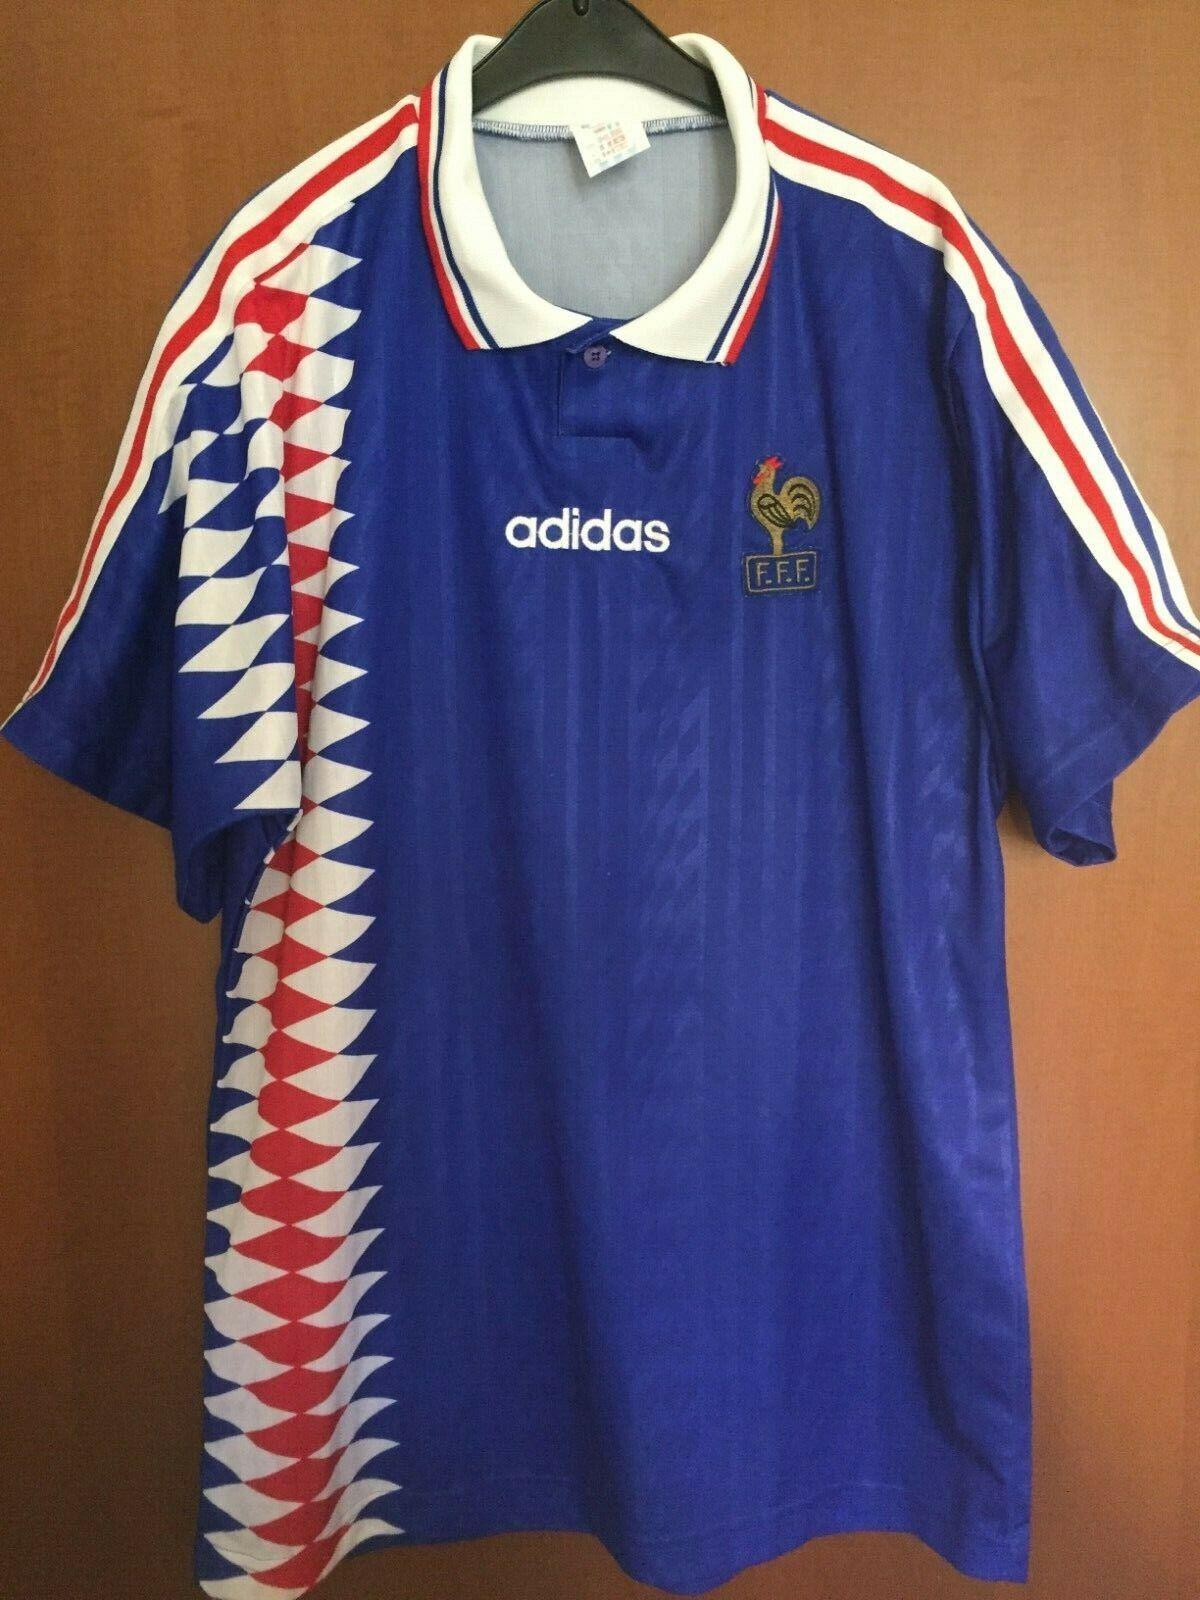 Maglia Shirt Maillot Trikot Camiseta France Francia 94 Adidas Vintage